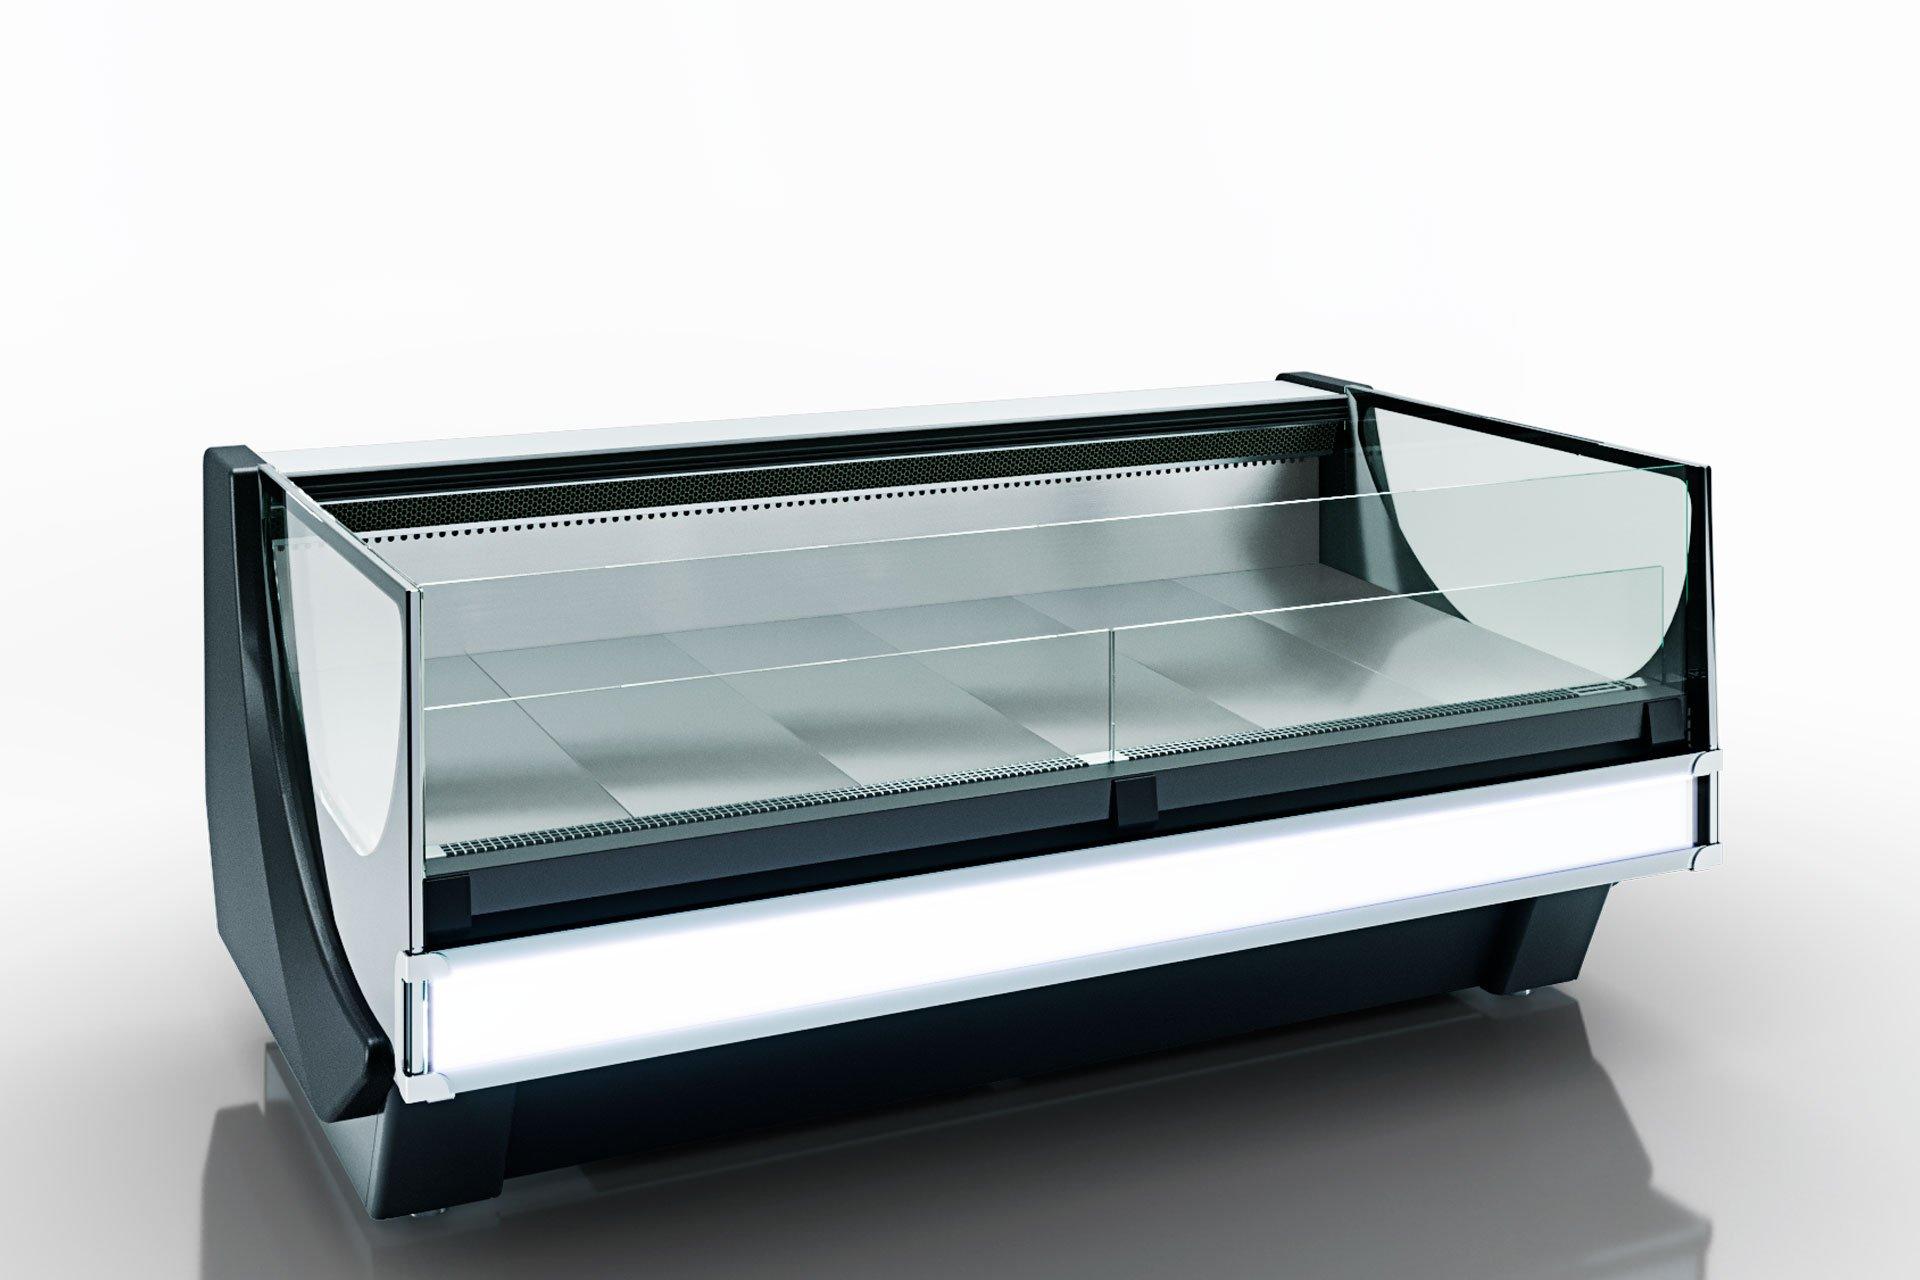 מקרר ויטרינה MISSOURI COLD DIAMOND MC 115 DELI PS/SELF M/A – NEW